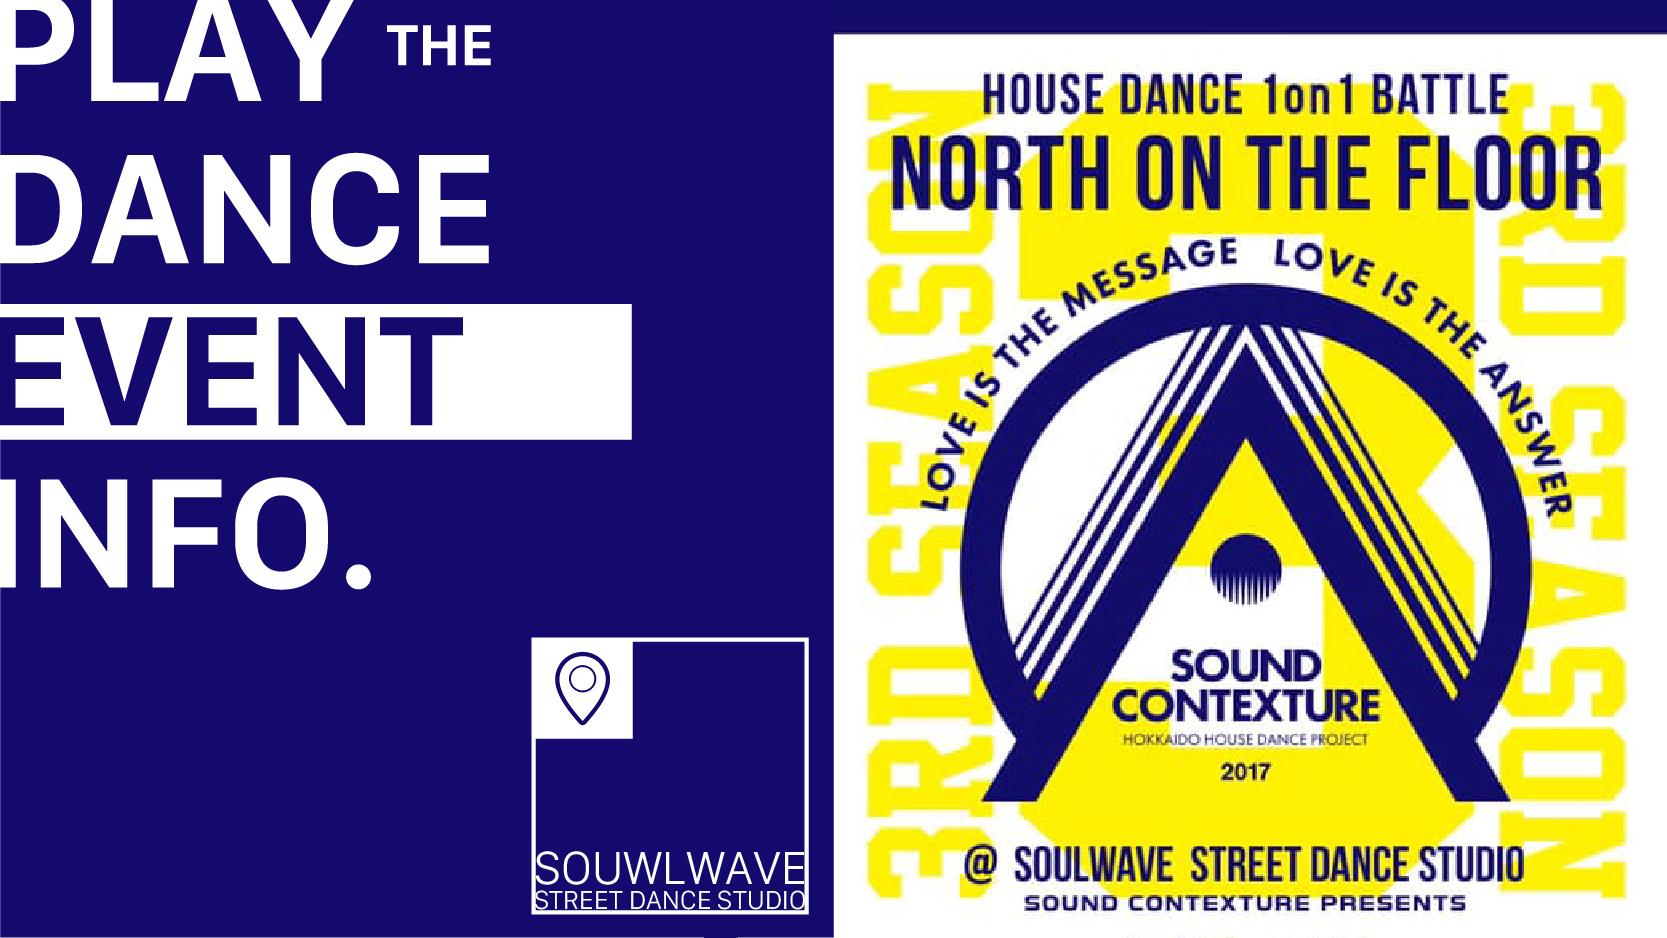 Sound Contexture PRESENTS HOUSE DANCE 1on1 BATTLE North On The Floor 3rd Season